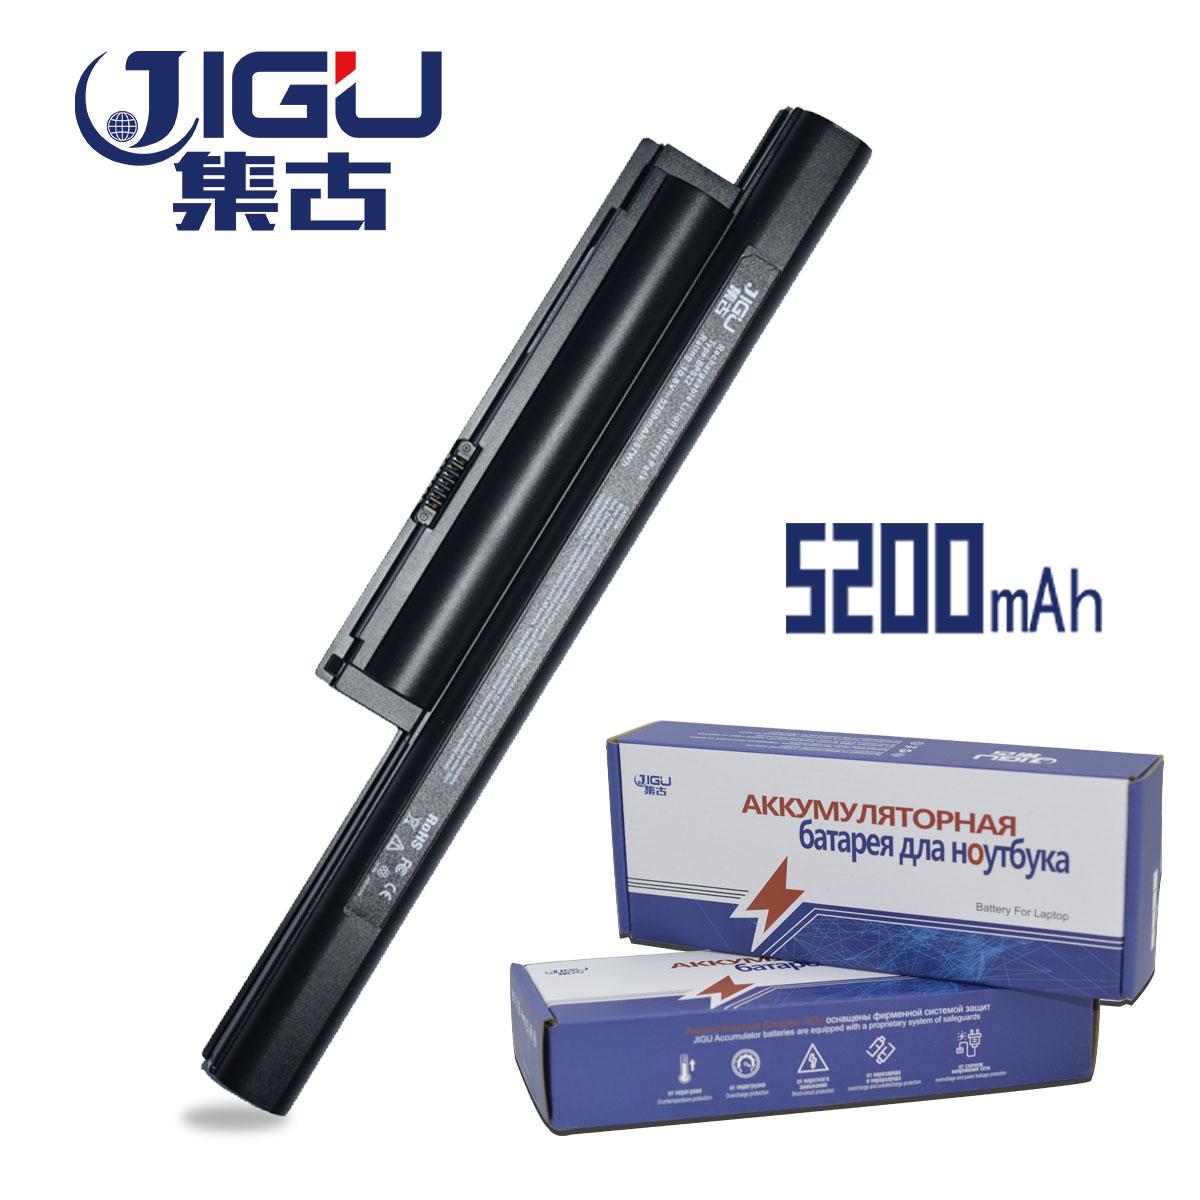 JIGU Battery For SONY BPS22 VGP-BPS22 VGP-BPS22A For VAIO VPC-E1Z1E VPC-EA1 EA16E EA1S EA45FG/B EA1Z1E EA27EC цена